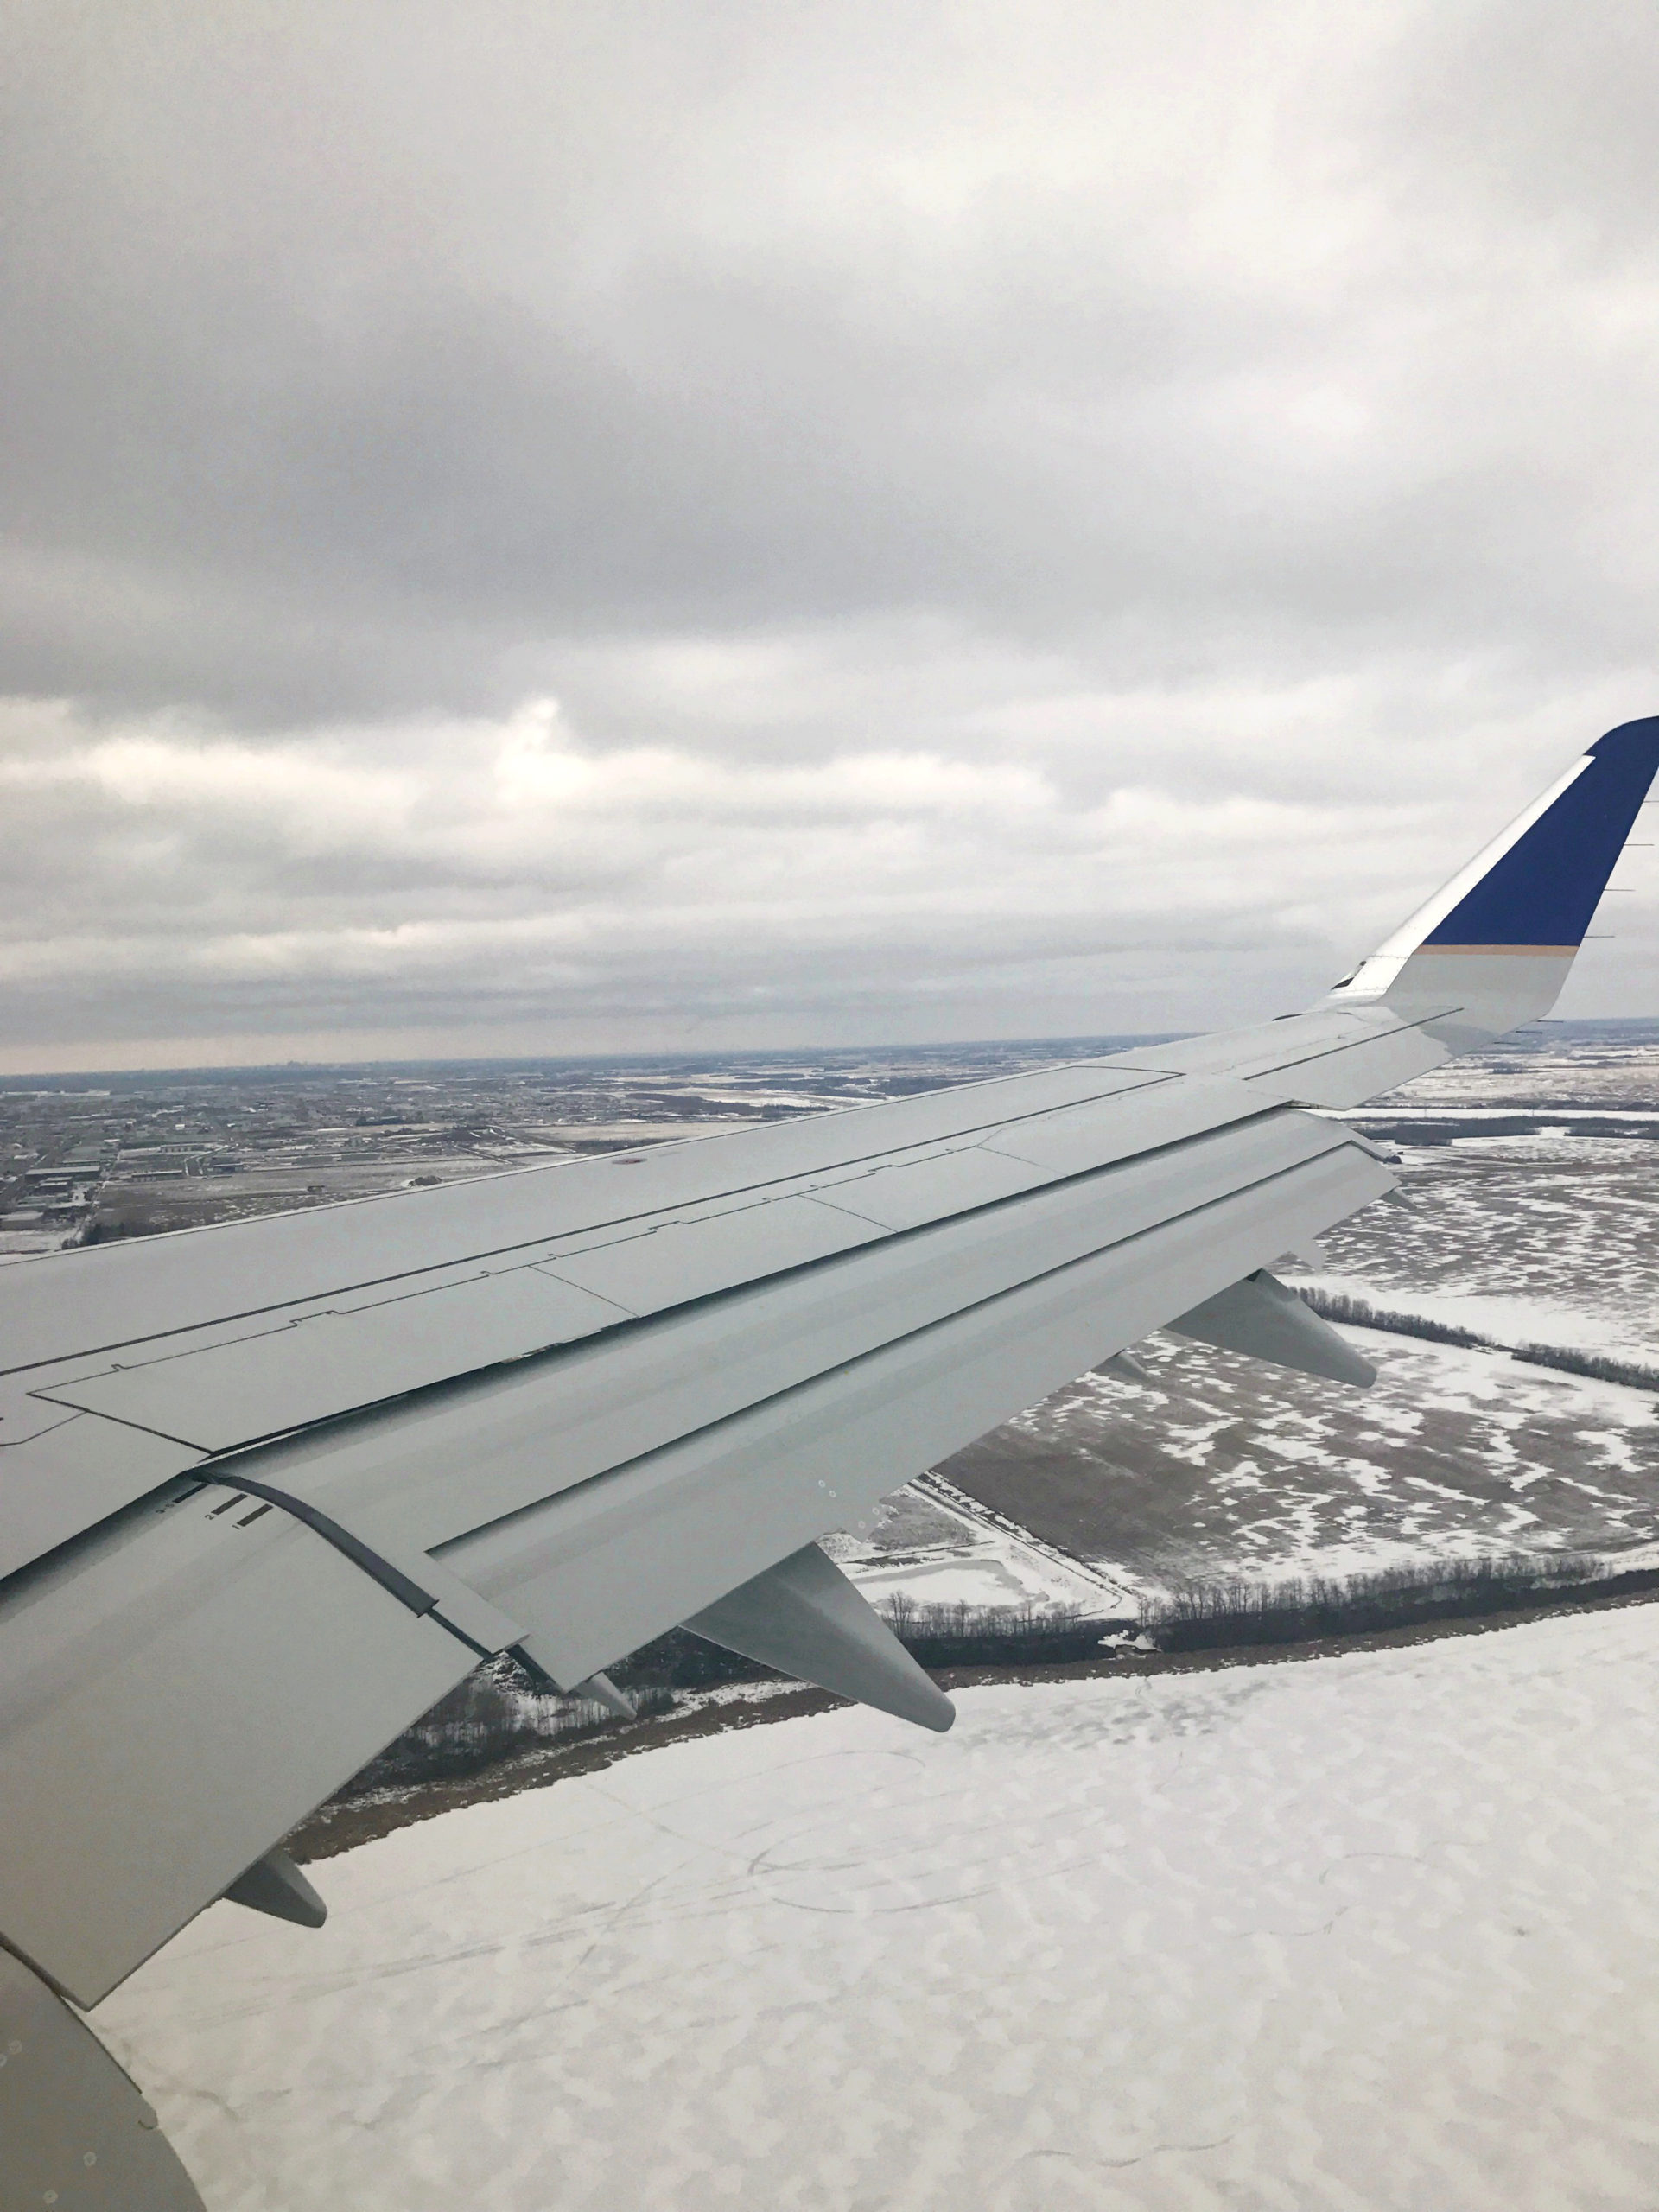 Airplane Photo Canada